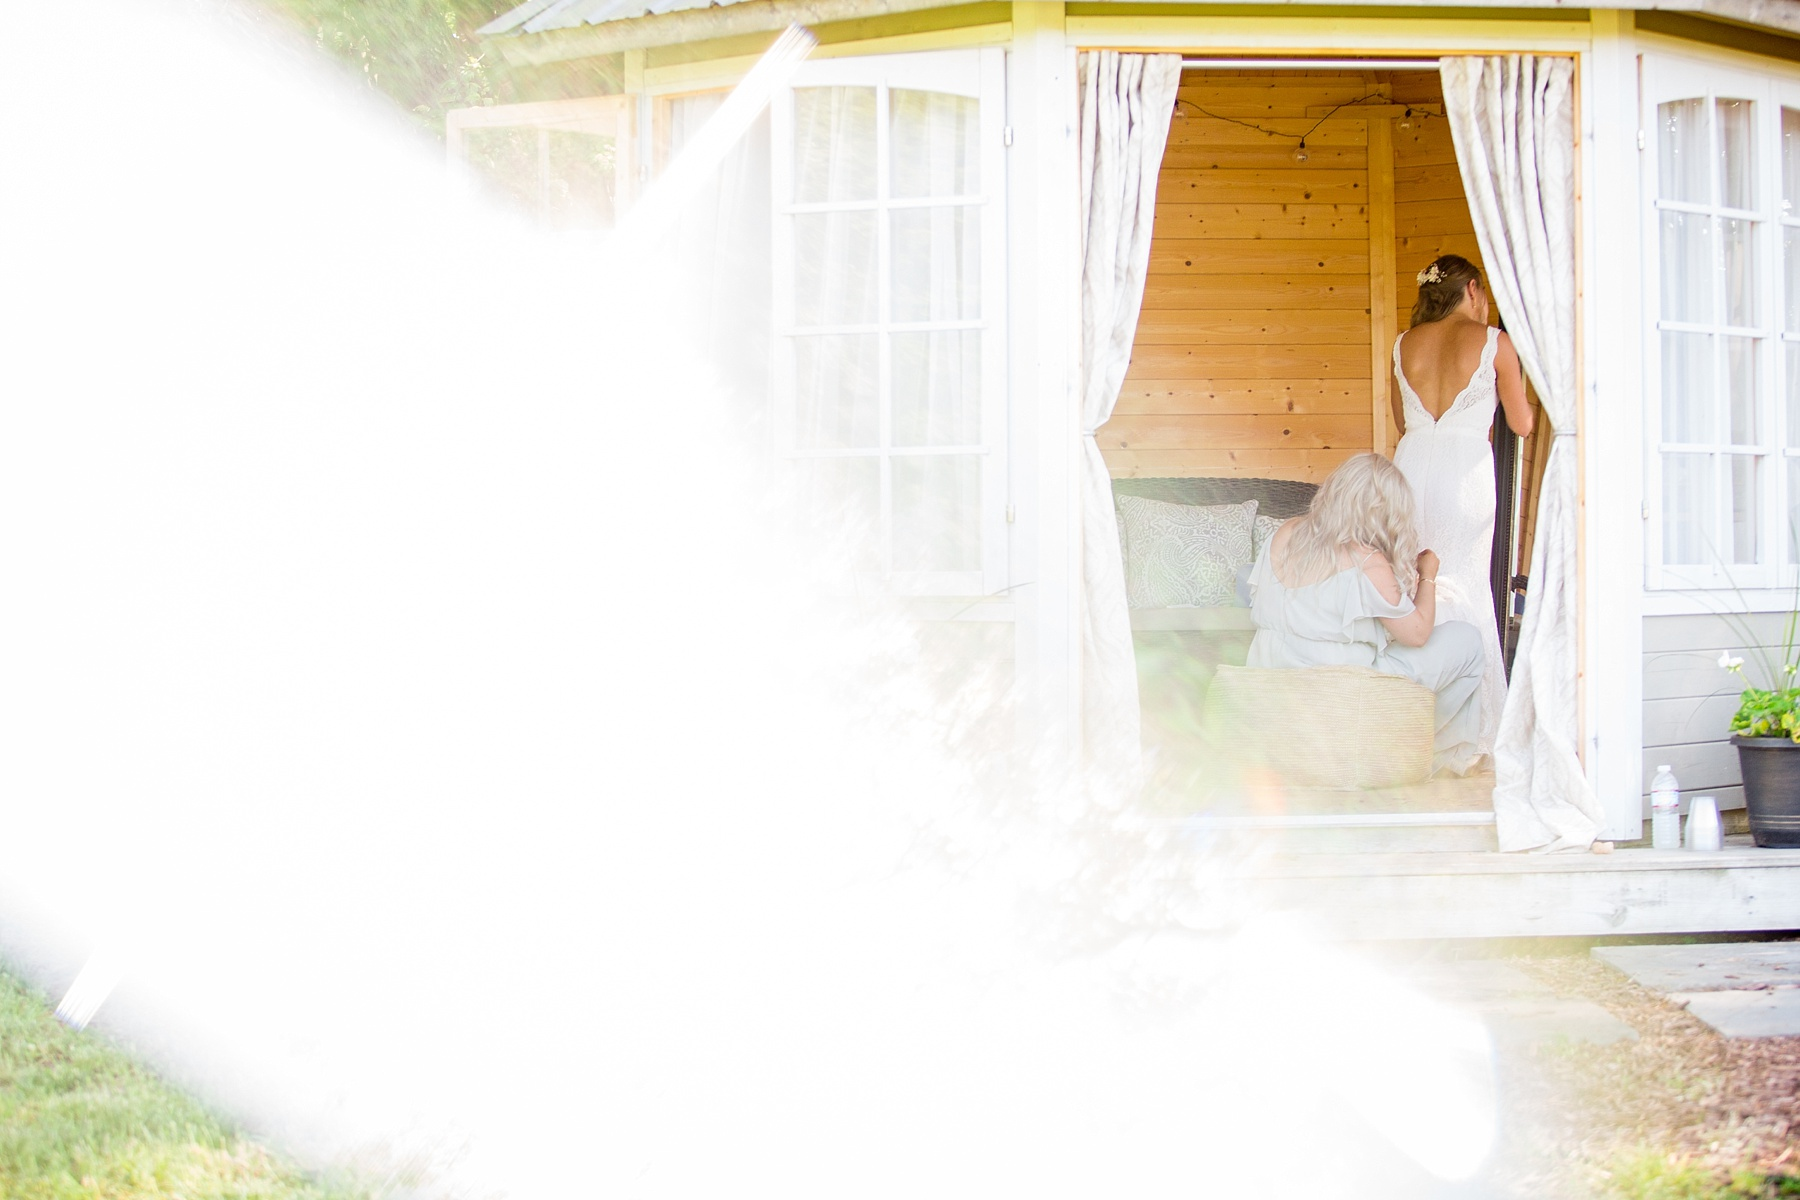 Brandon_Shafer_Photography_Kara_Doug_12_corners_Wedding_Benton_Harbor_0055.jpg